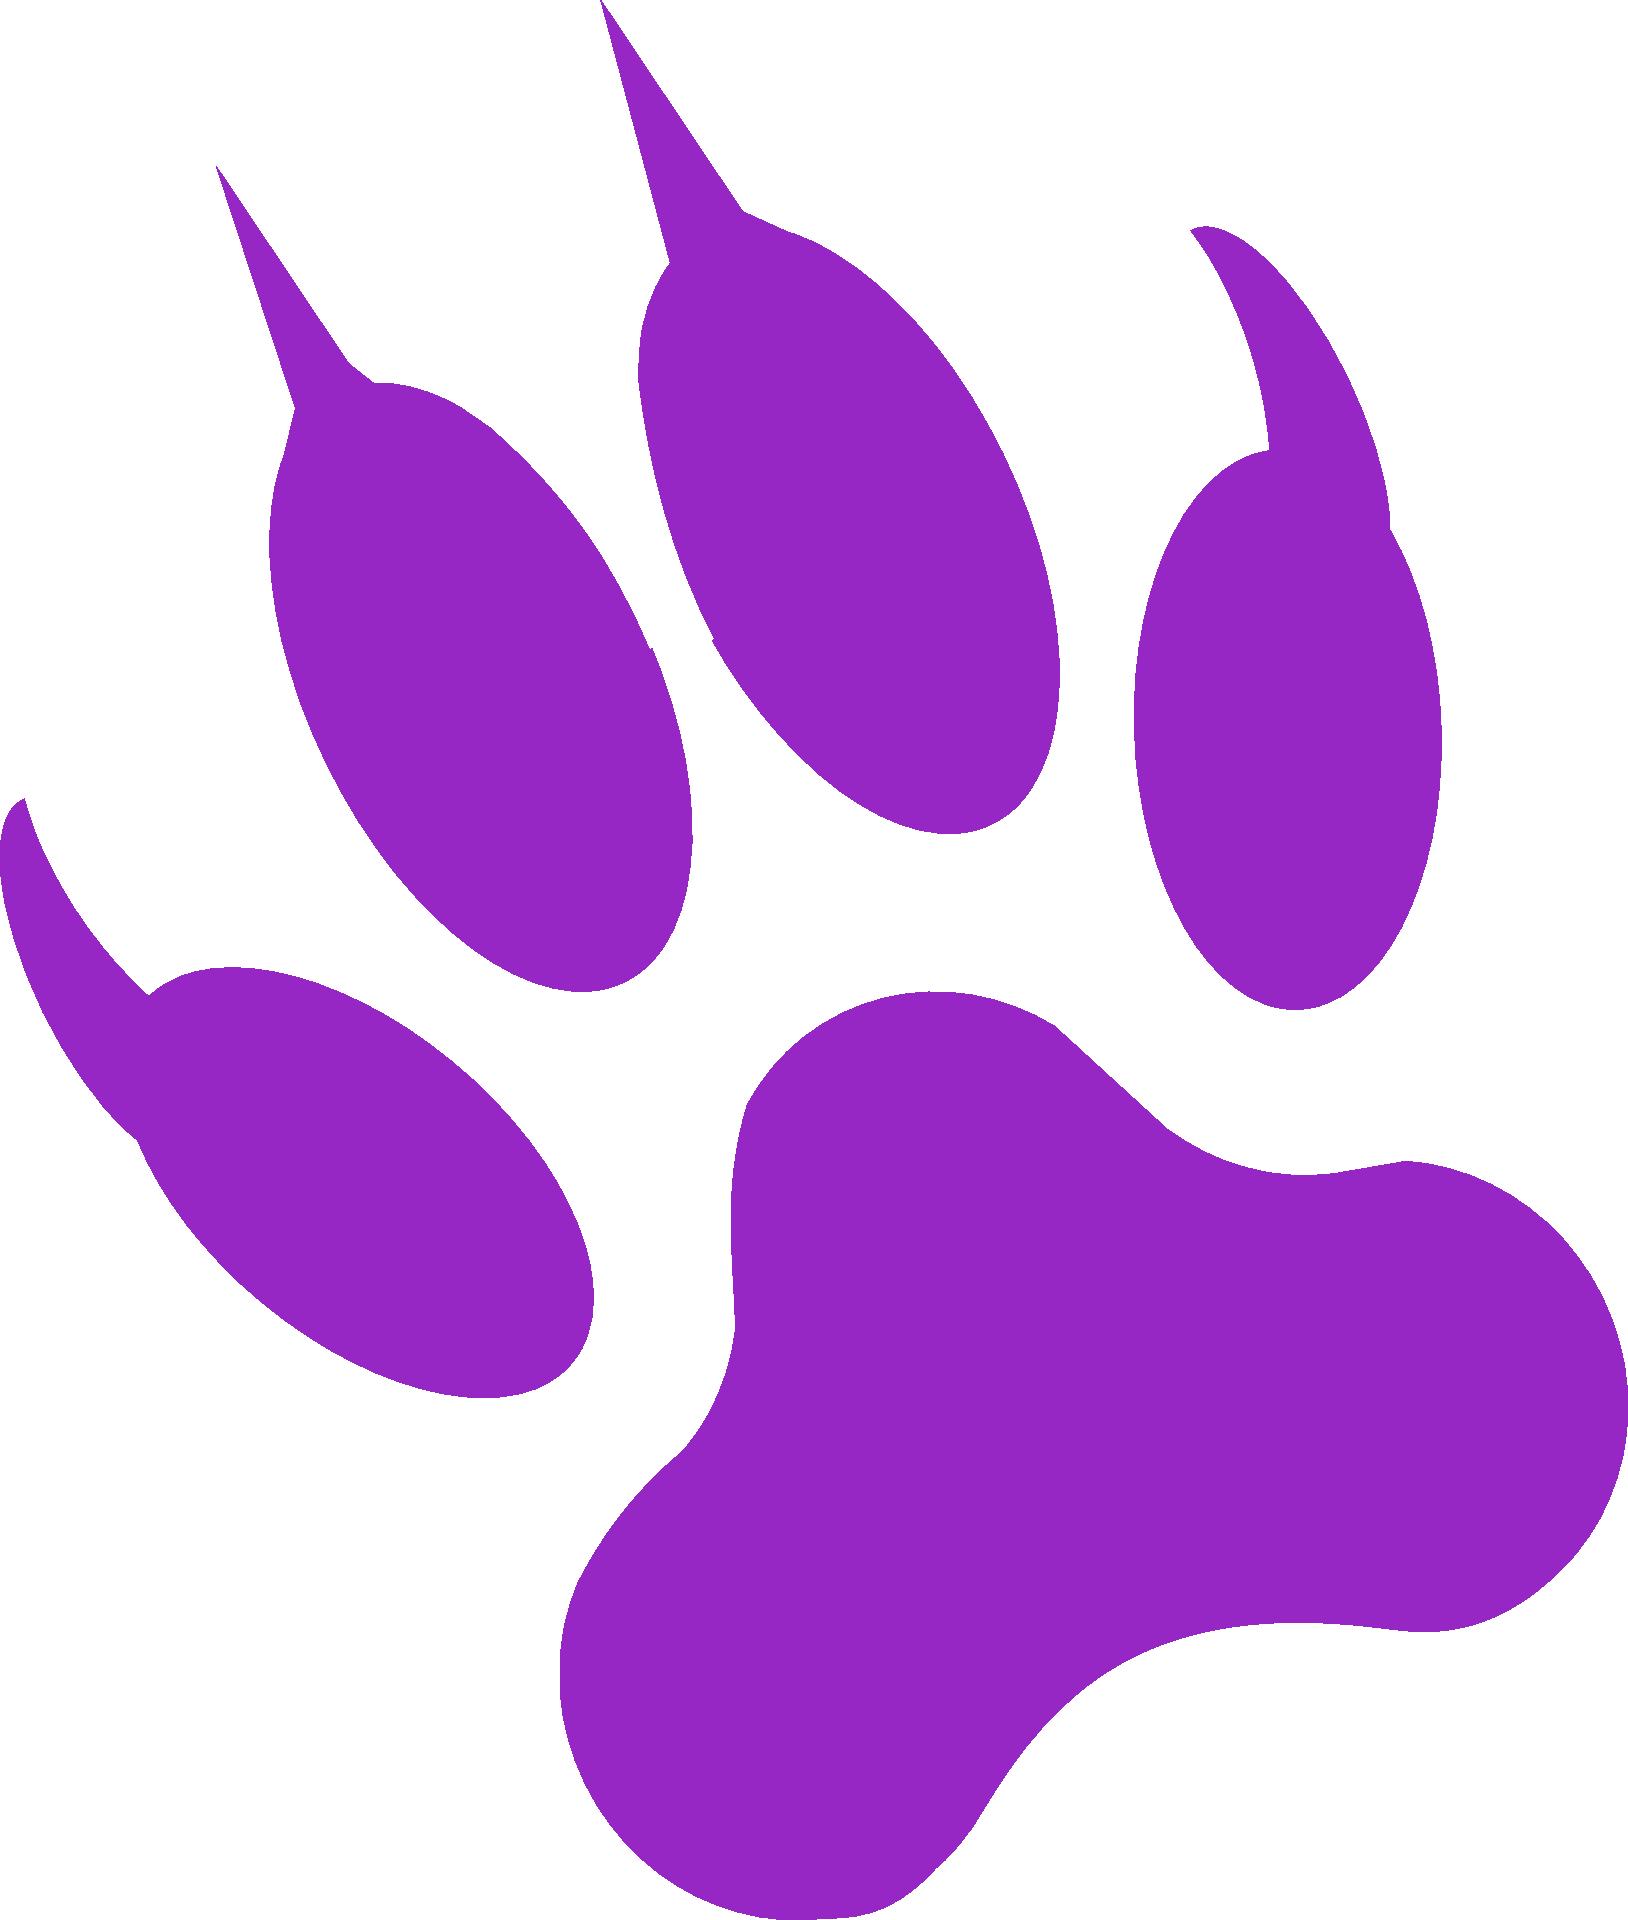 Paw clipart black panther. Gray wolf cougar panthera